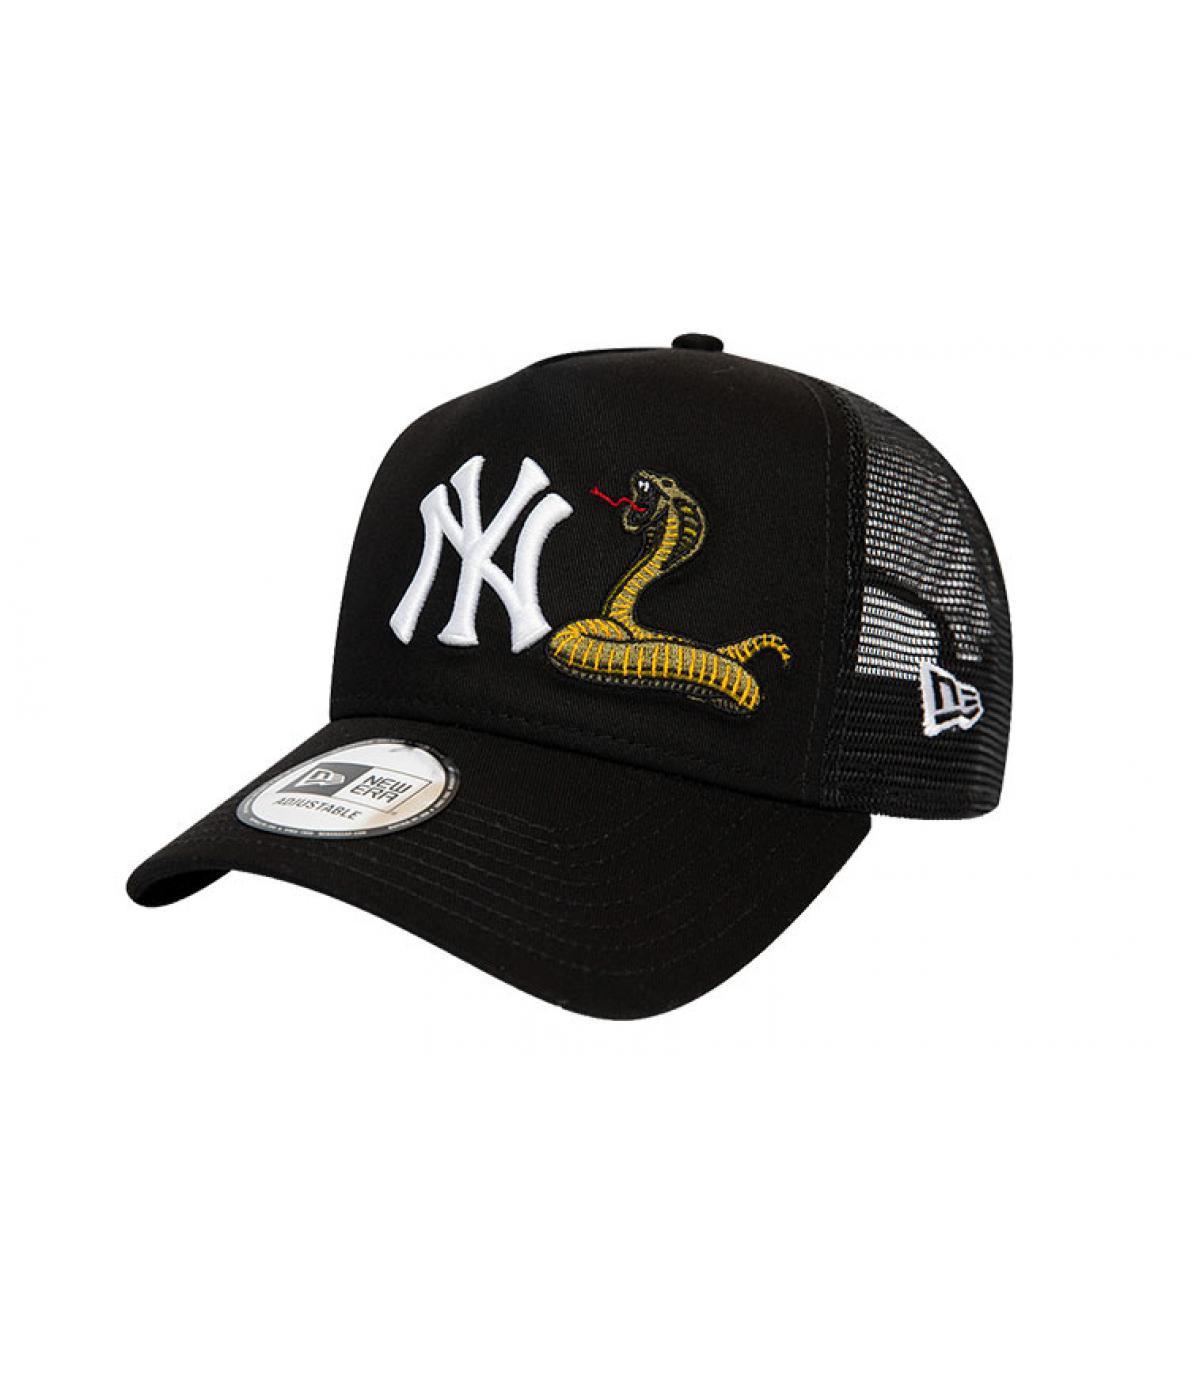 Details Trucker MLB Twine NY black - Abbildung 2